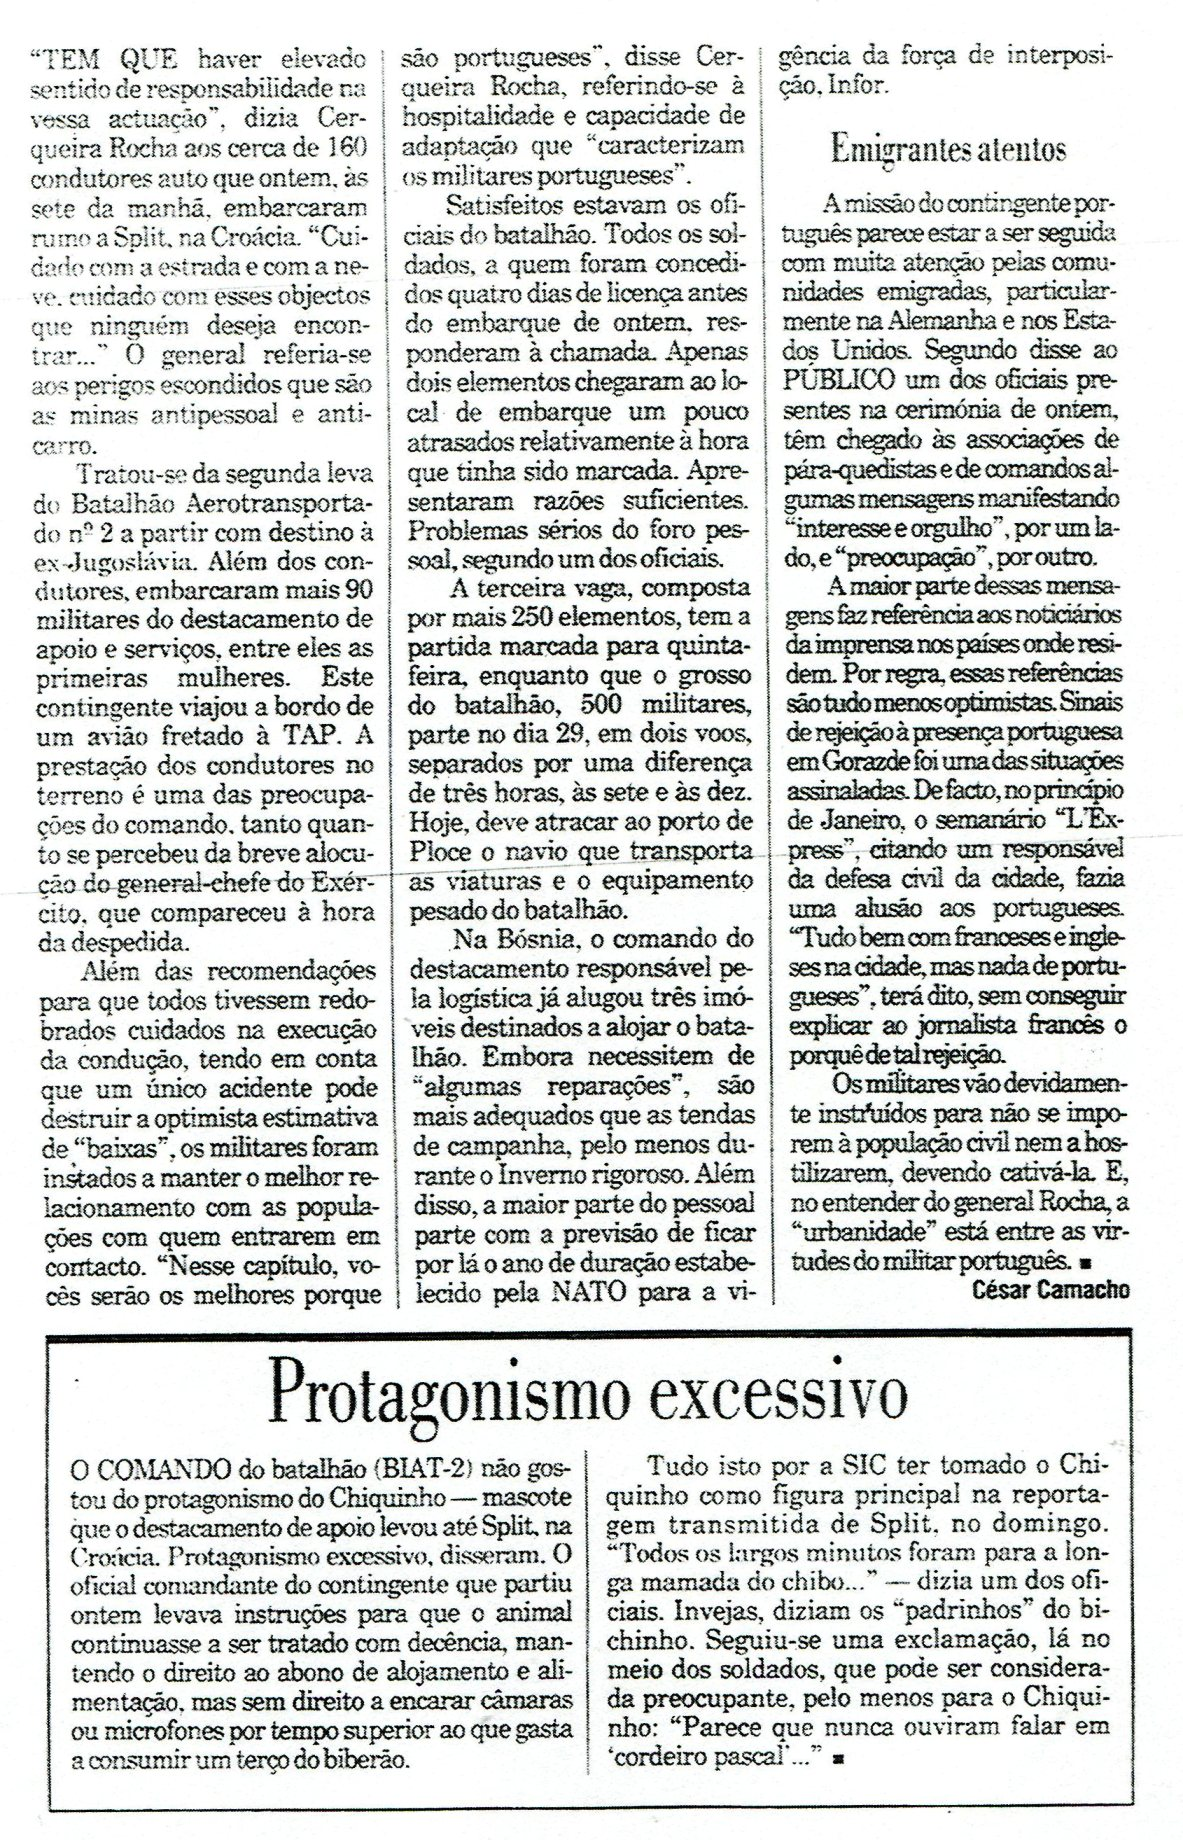 23JAN1996 - Público